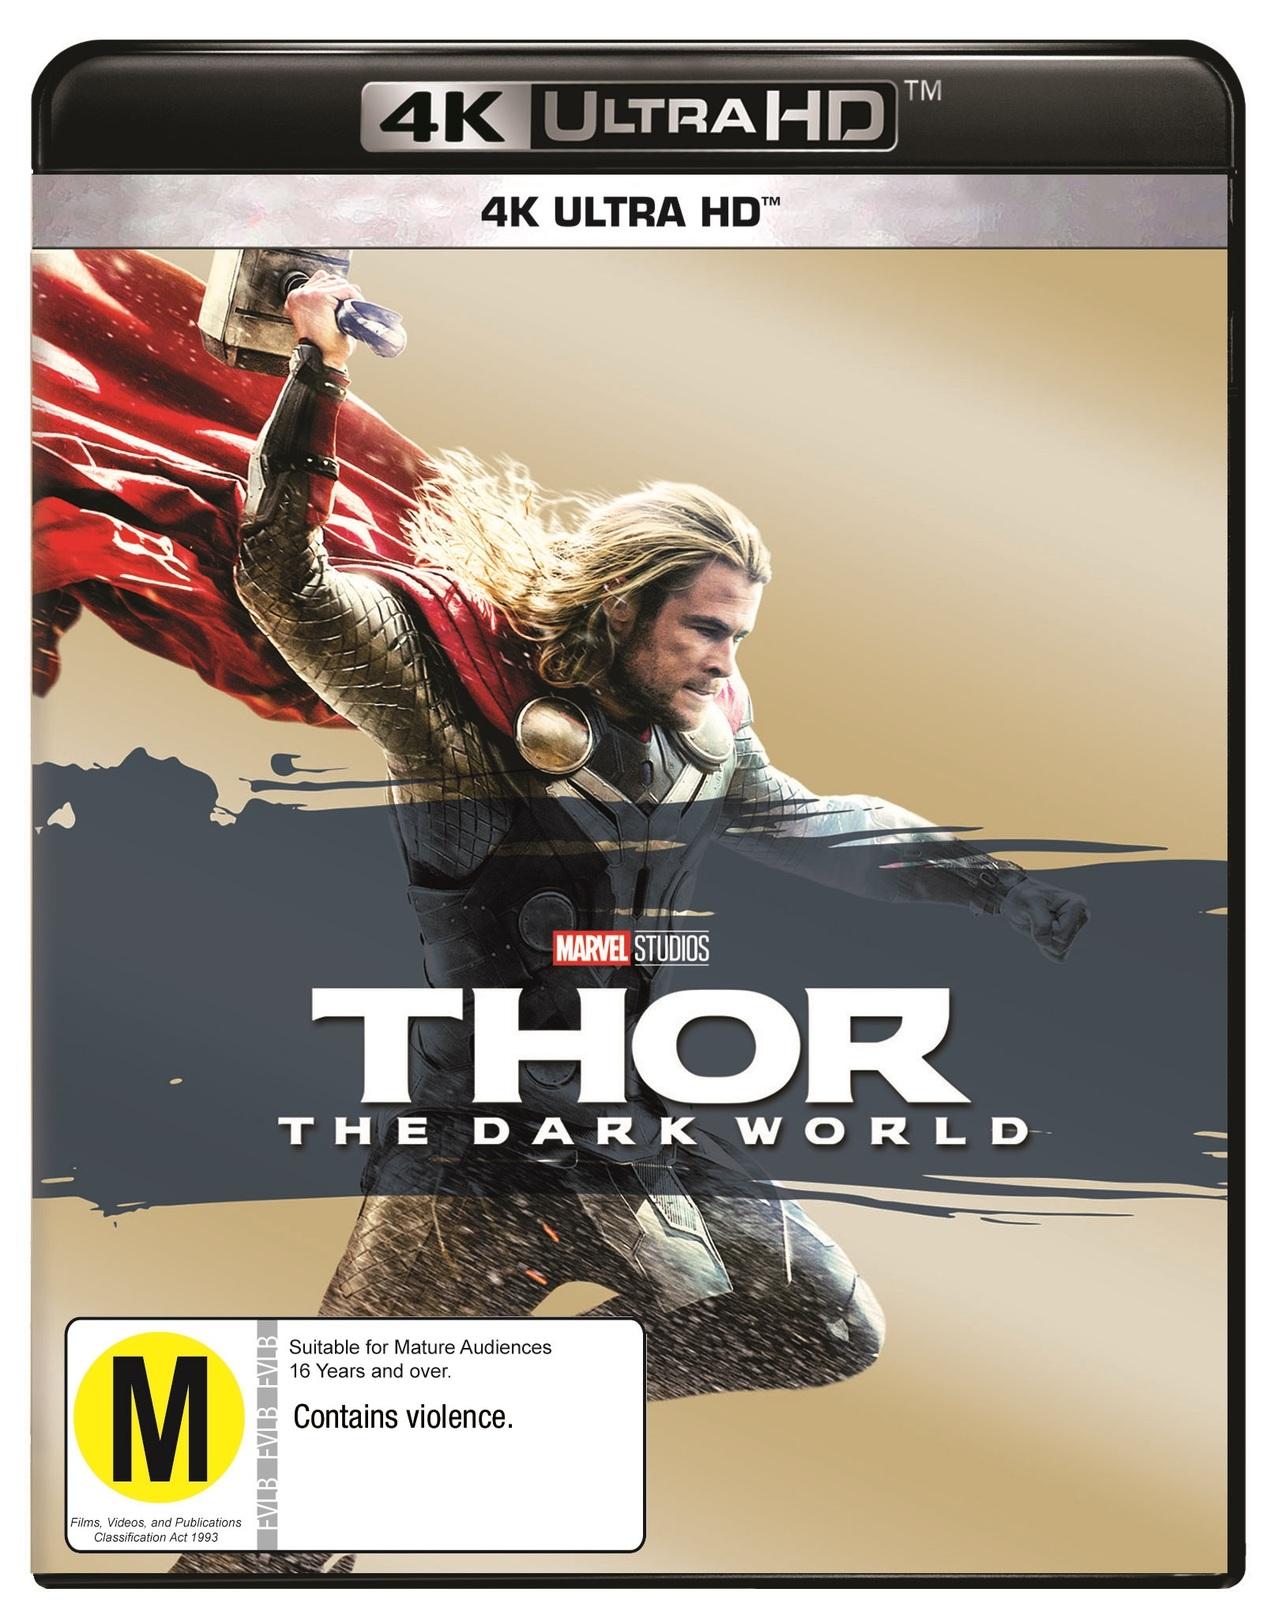 Thor: The Dark World on UHD Blu-ray image